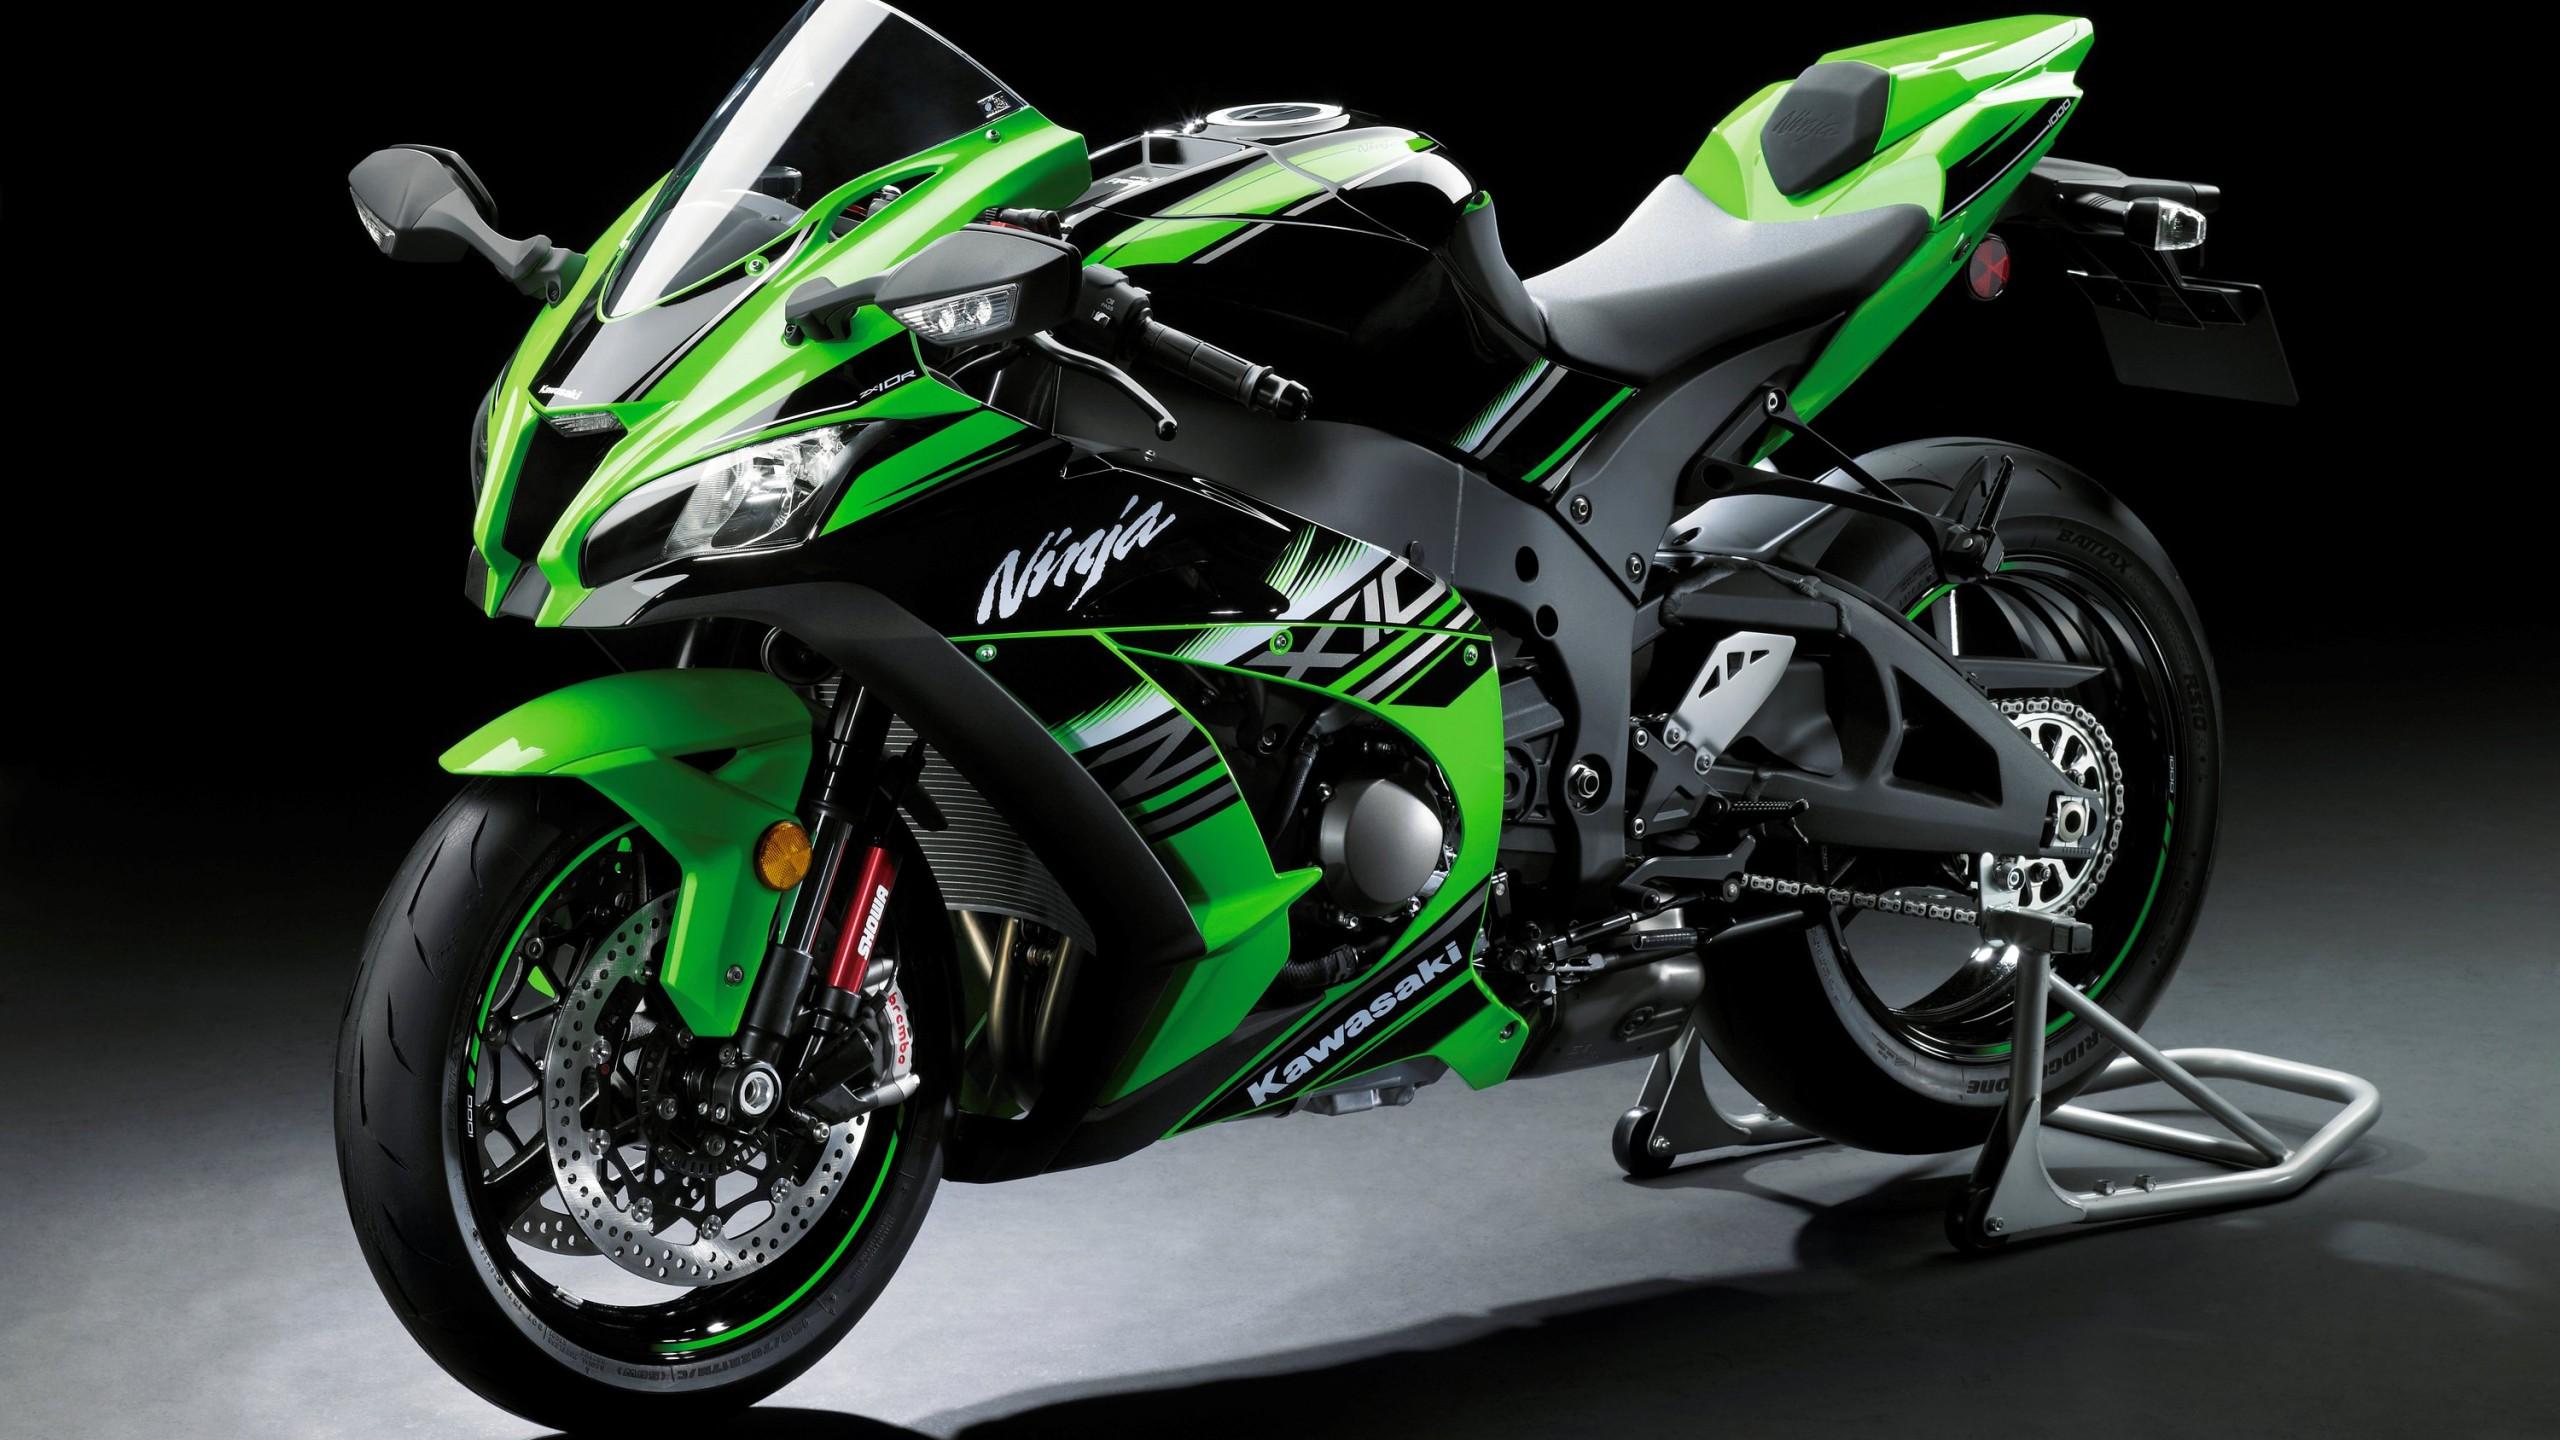 Ninja H2r Price In India 2019 2019 Kawasaki Ninja H2r